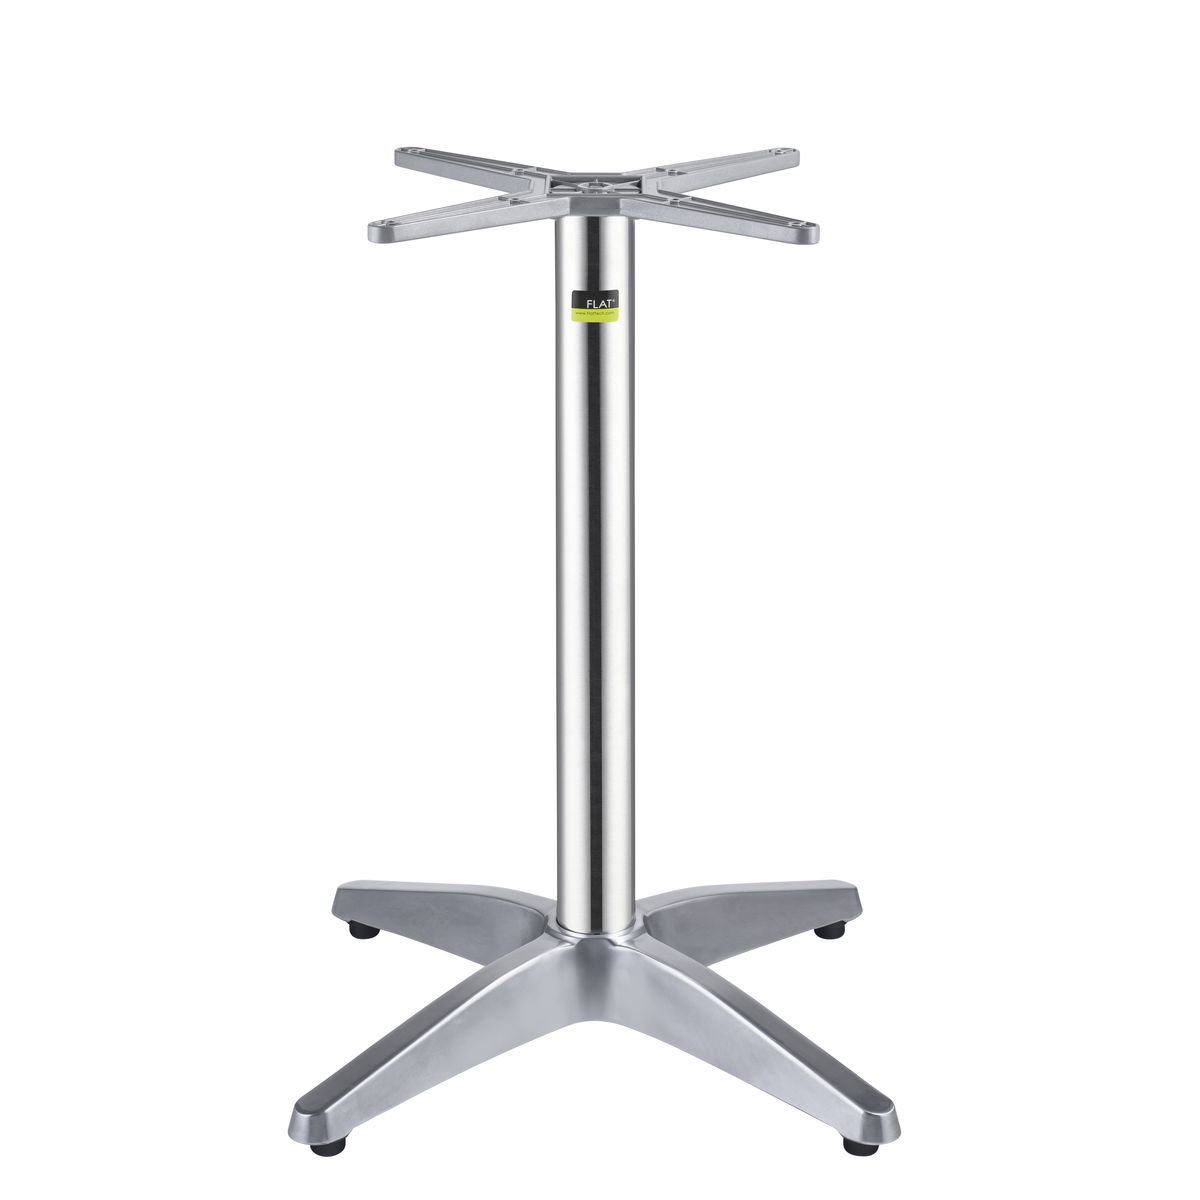 AUTO-ADJUST CX26 Table Base